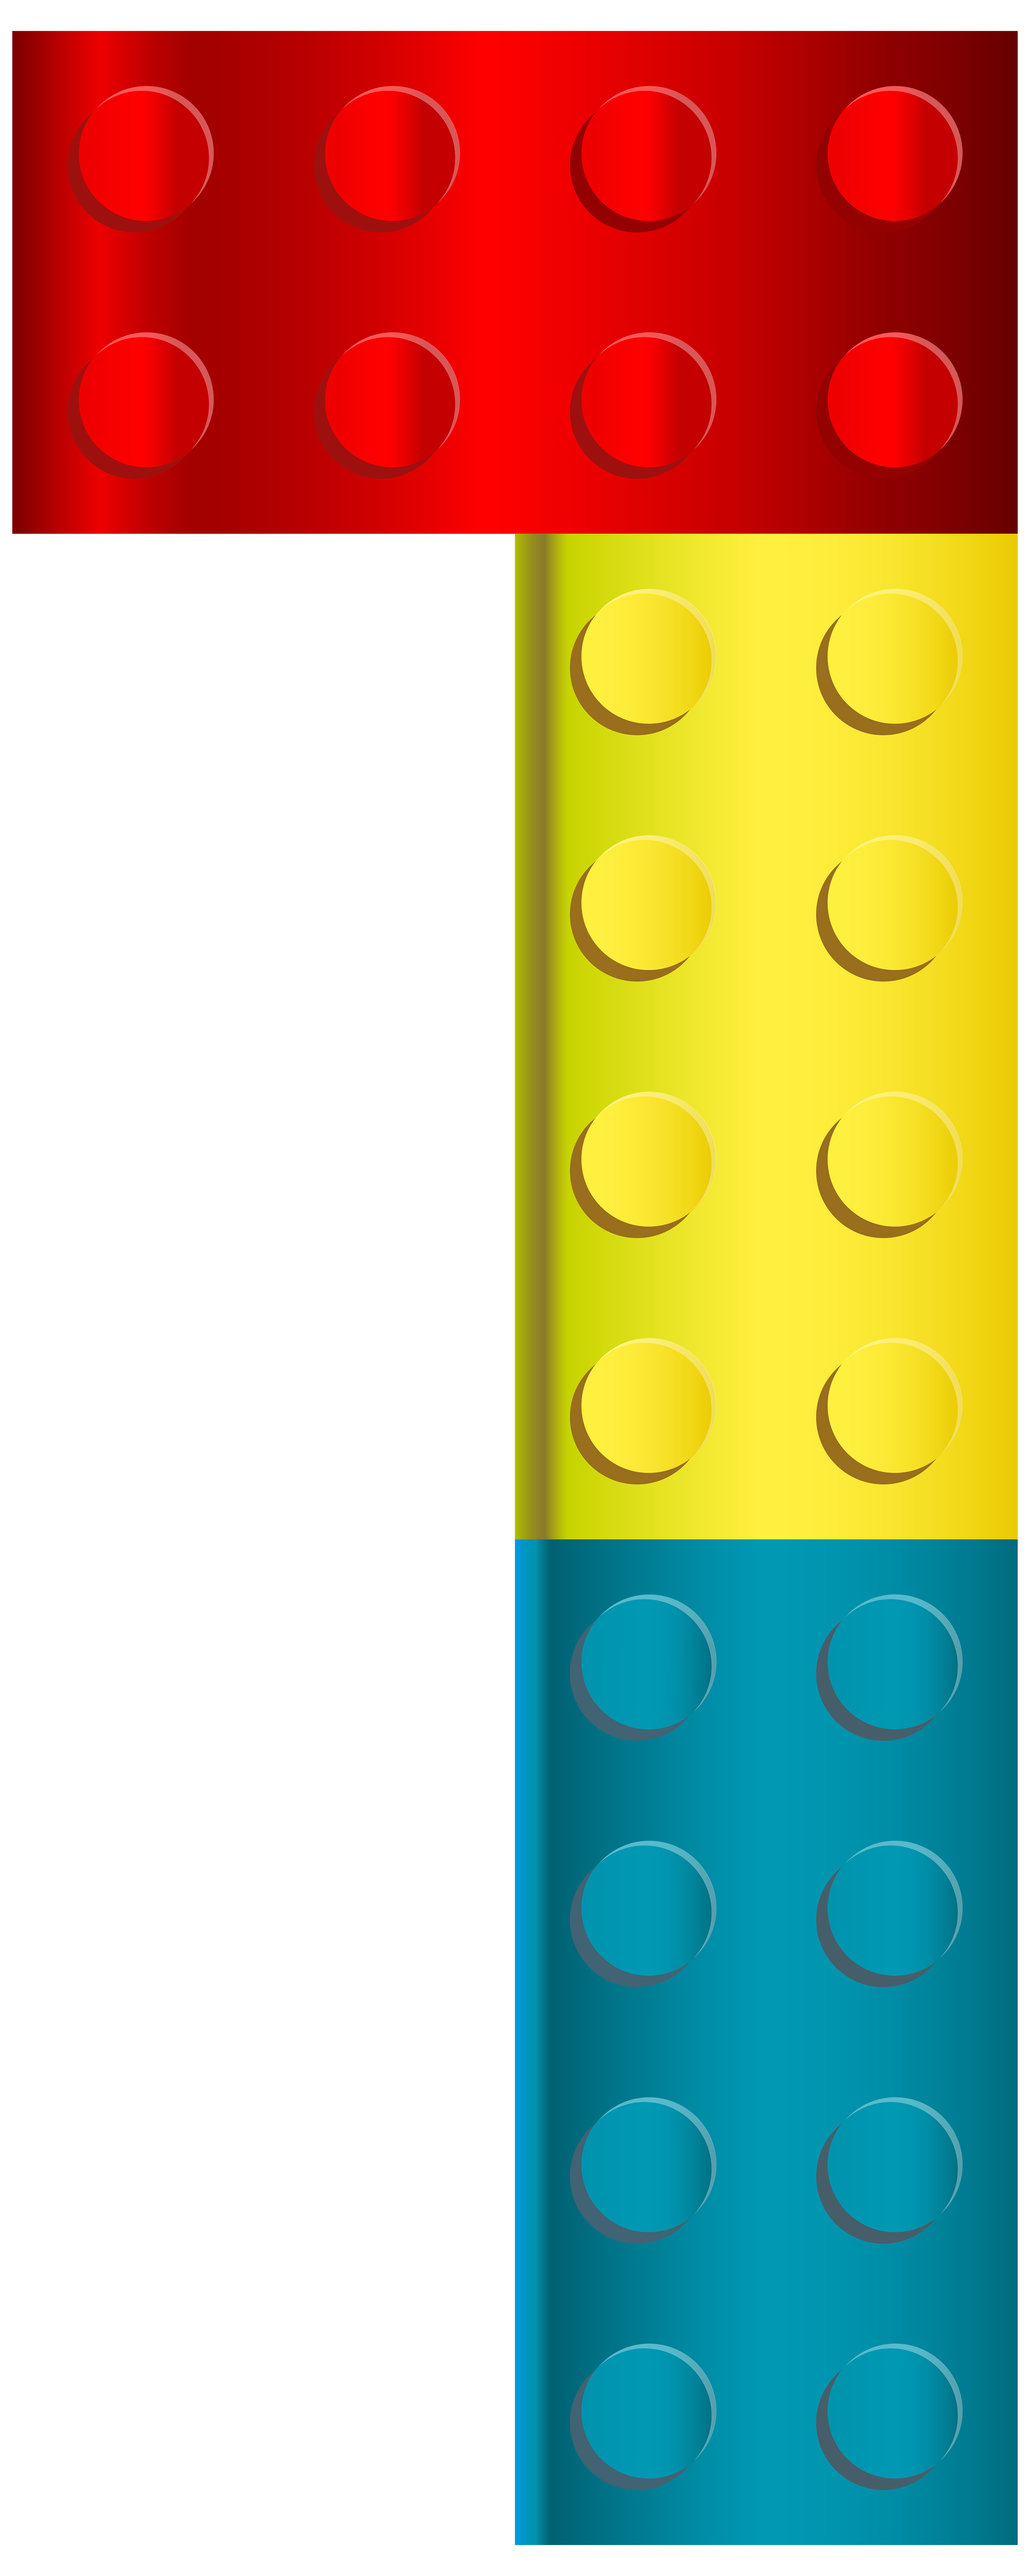 3200x8000 Lego Number One Png Transparent Clip Art Imageu200b Gallery